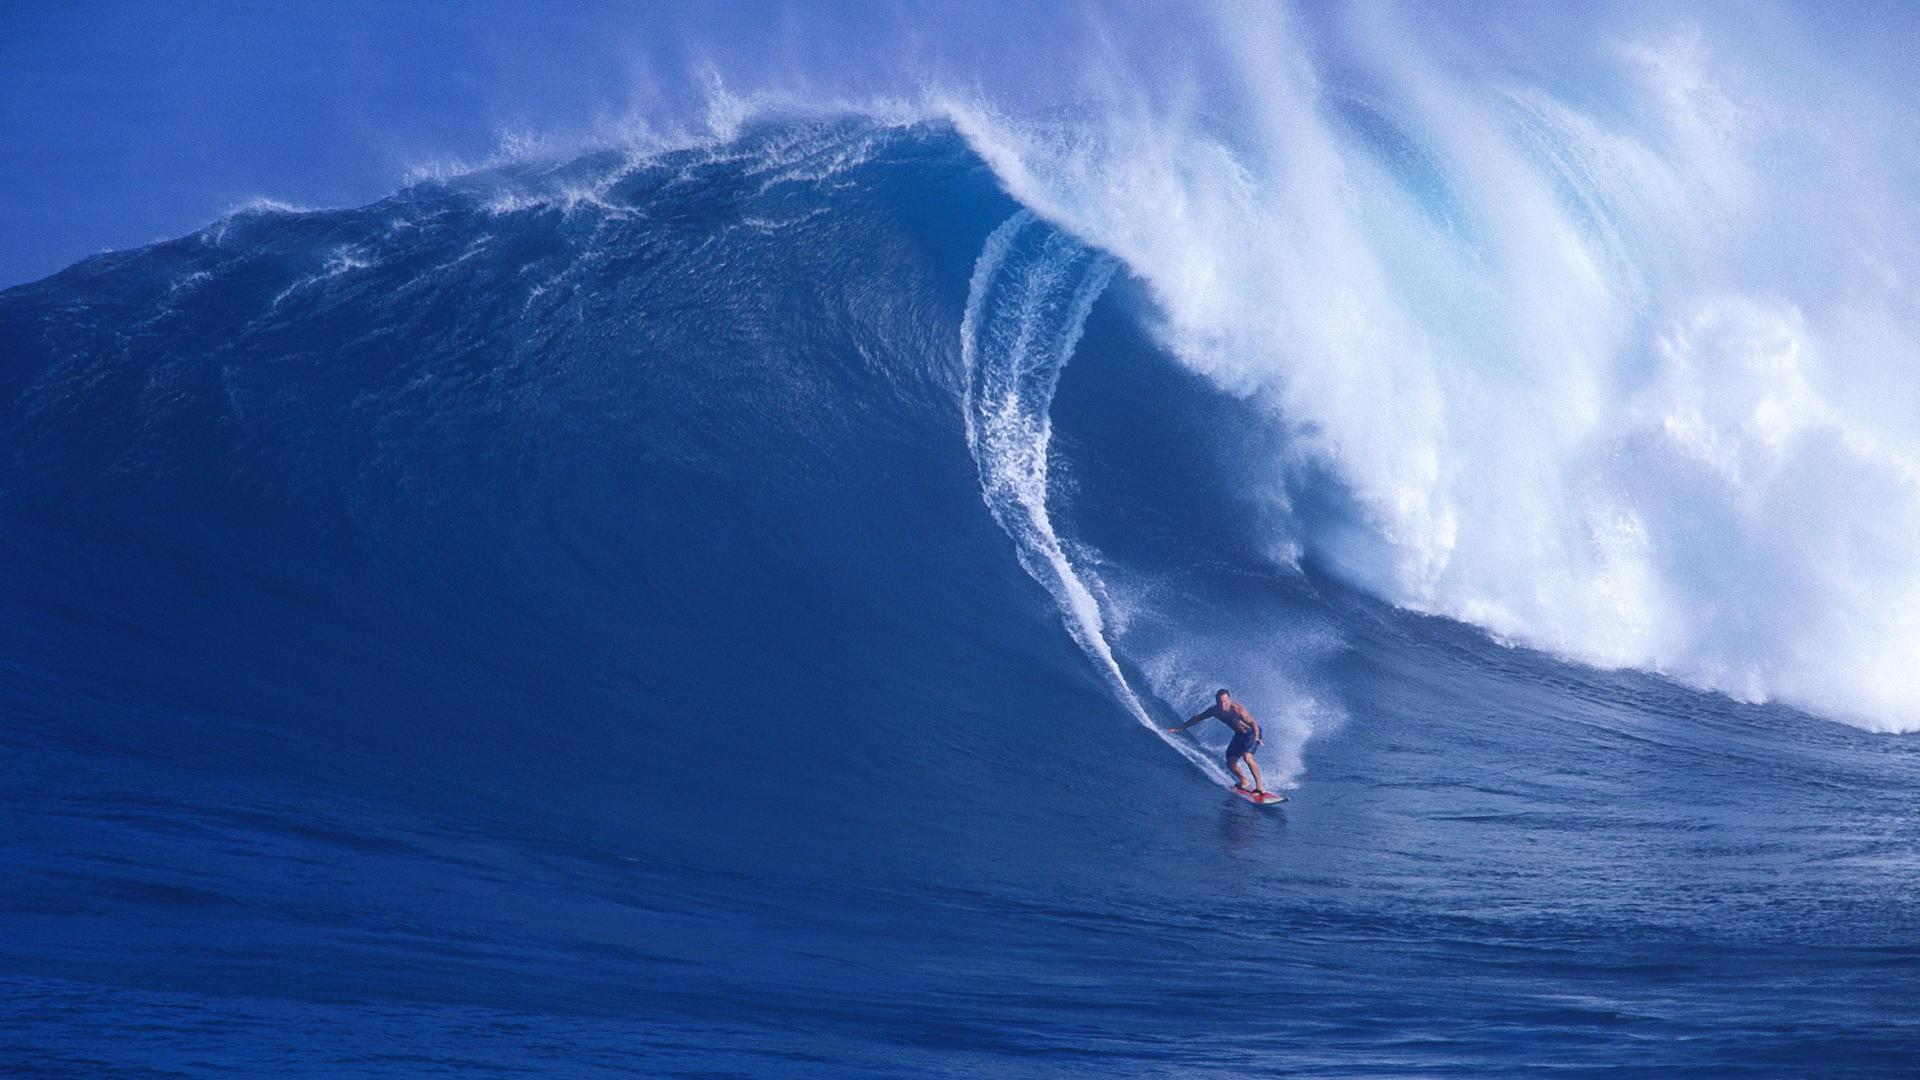 Pics Photos   Surfing Go Go Pics Wallpapers 1920x1080 Best 1920x1080